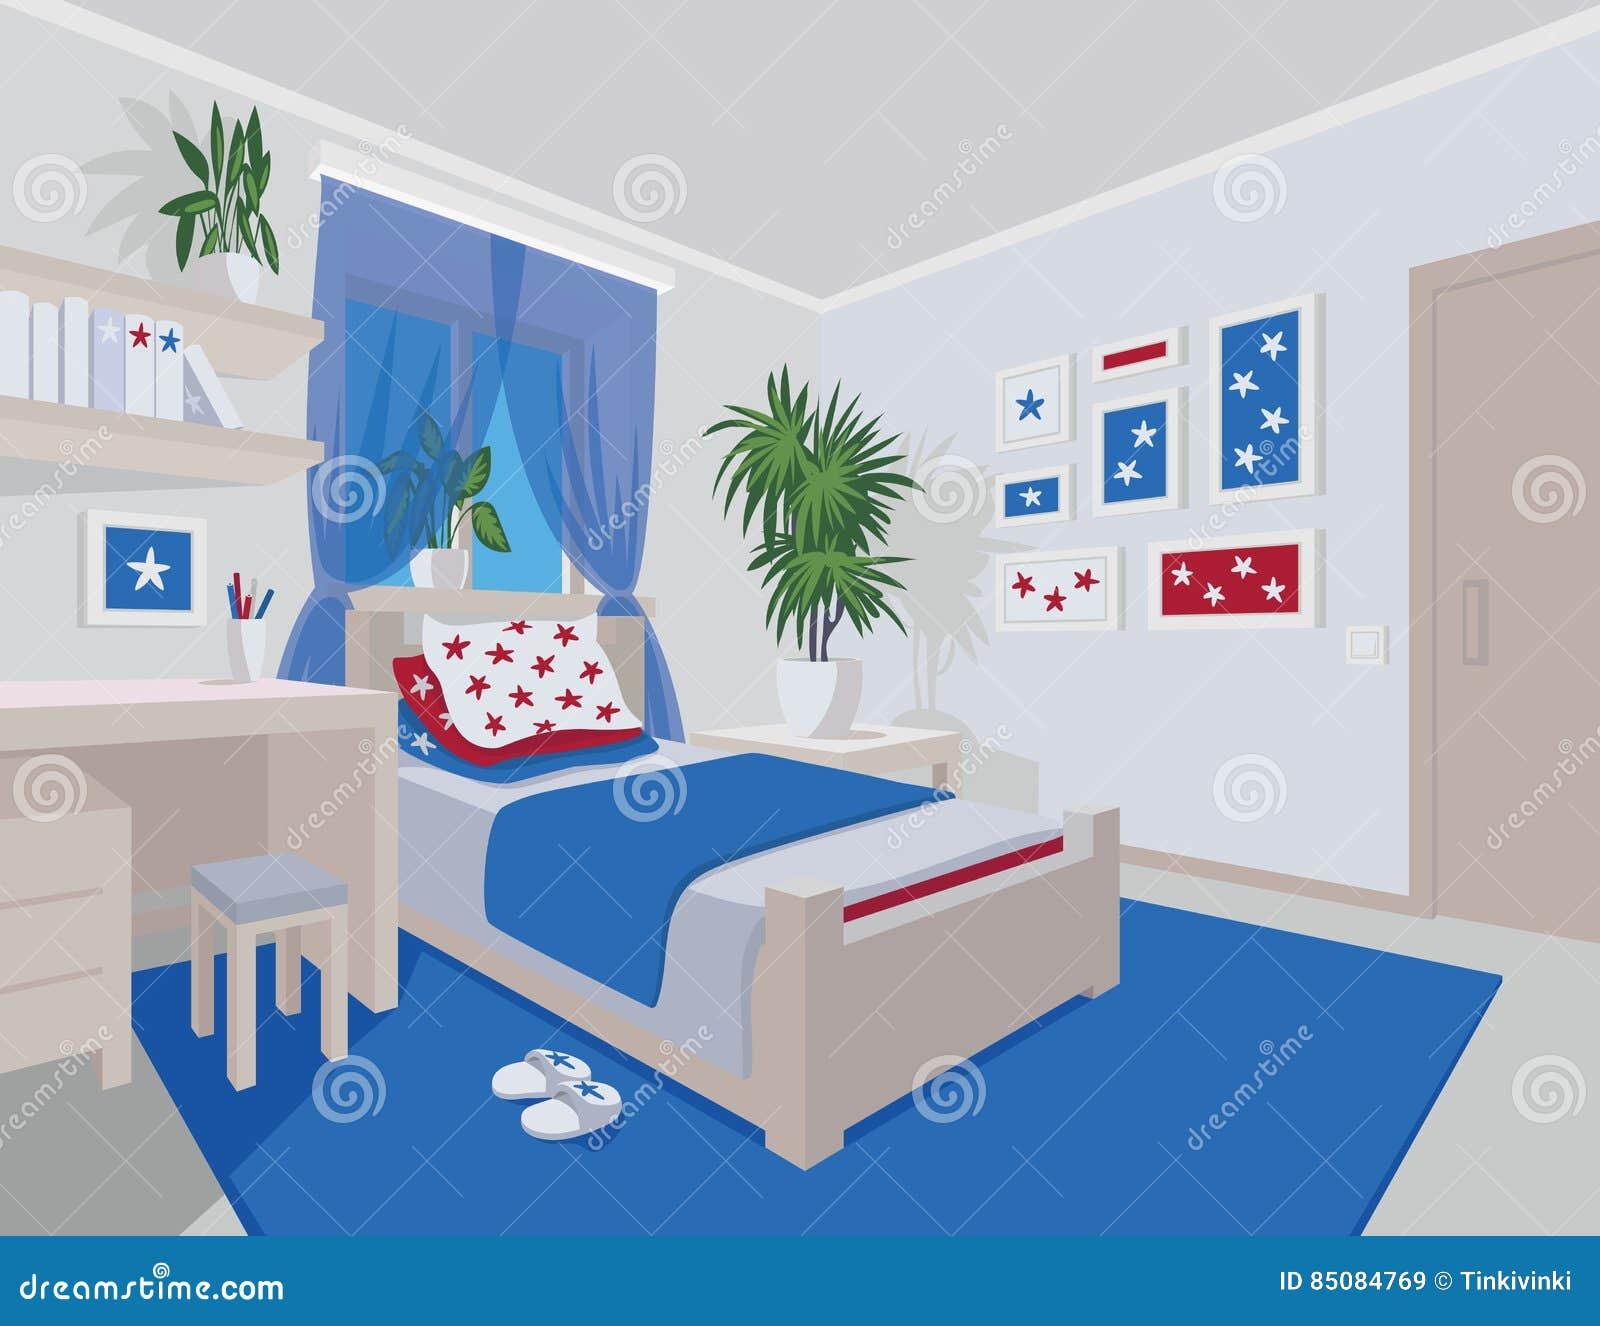 Cartoon Colorful Room: Bedroom Scene Cartoon Stock Illustrations